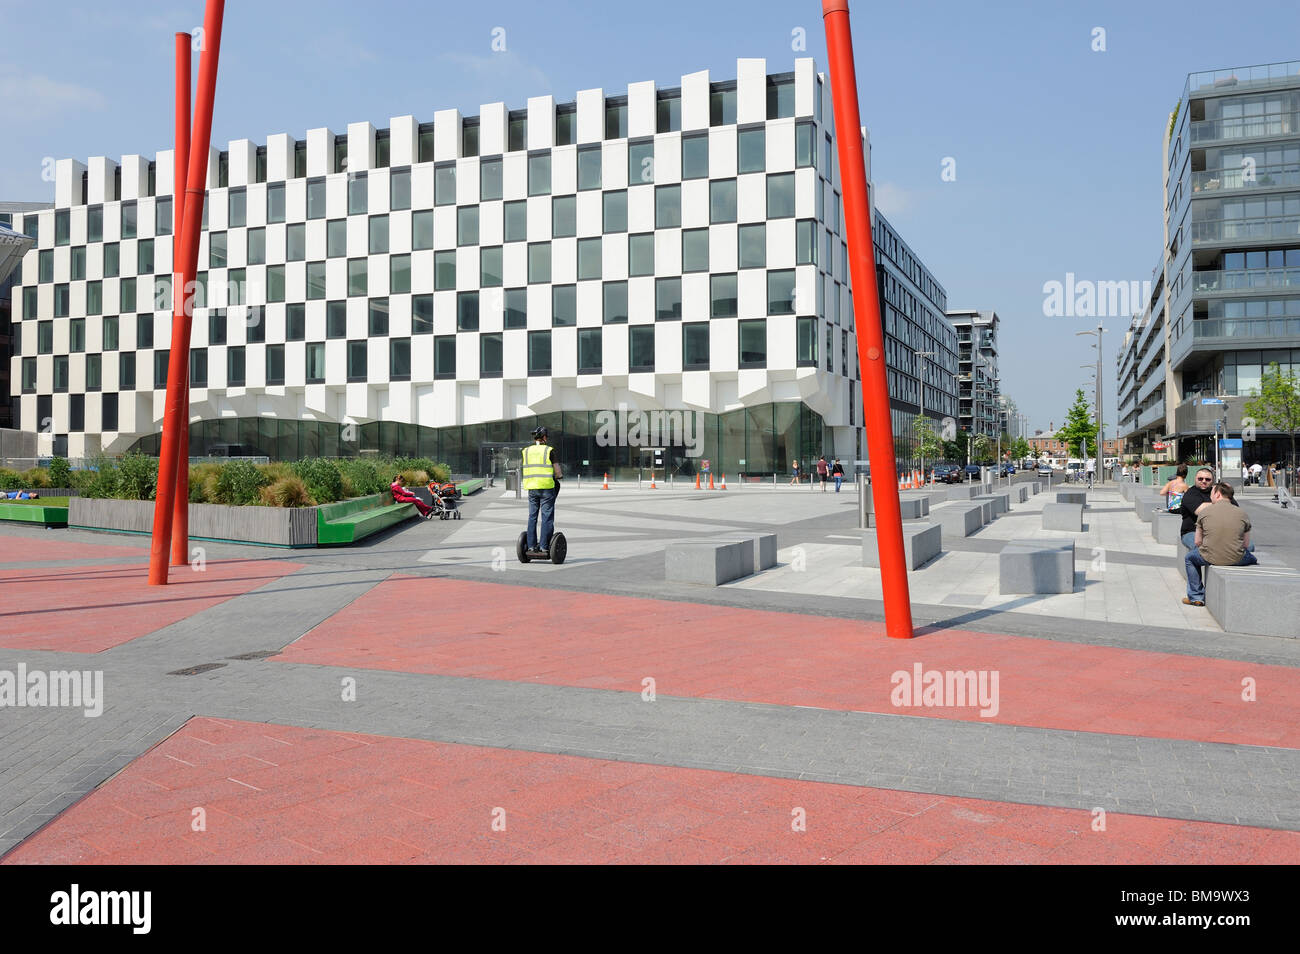 Blood stone Building.  Docklands. Dublin City. Republic of Ireland - Stock Image